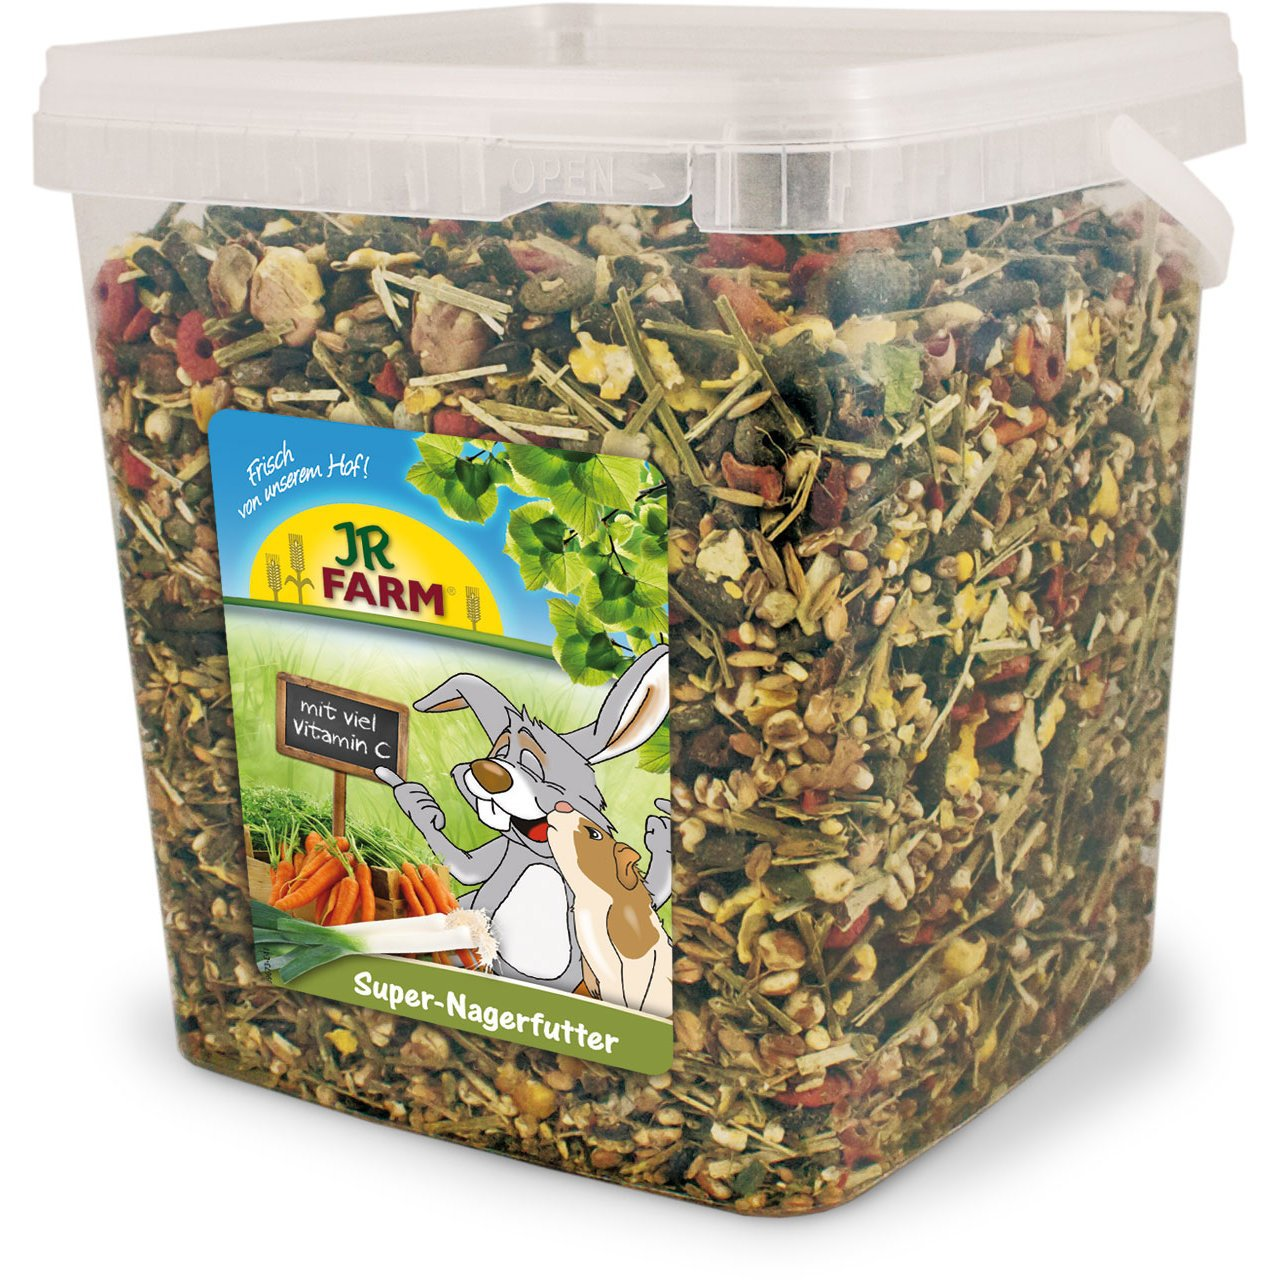 JR Farm Super-Nagerfutter, 5 l Eimer (2,5kg)